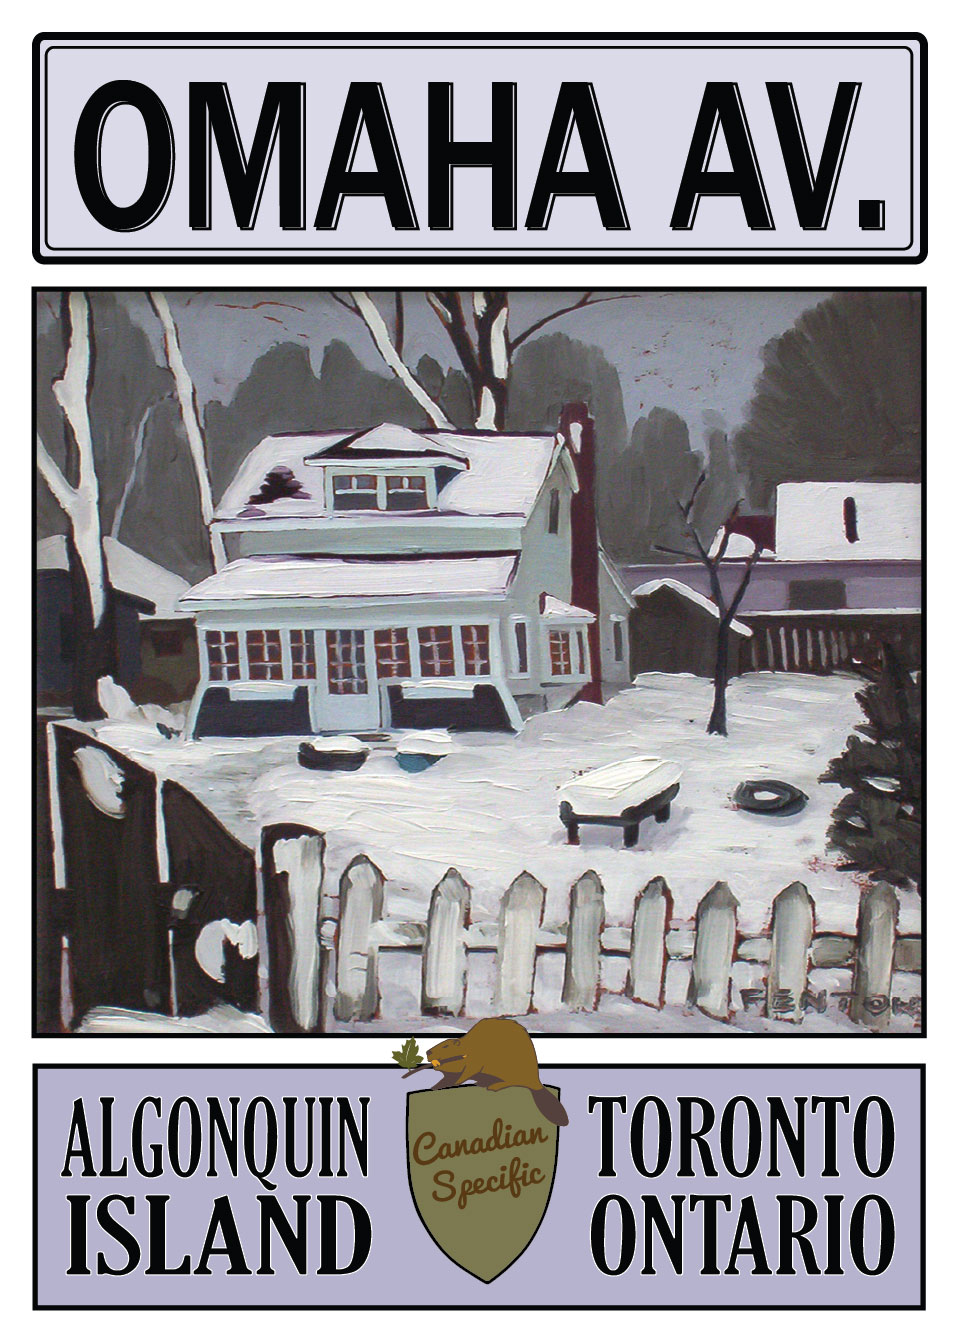 24 Omaha Ave, Toronto Island